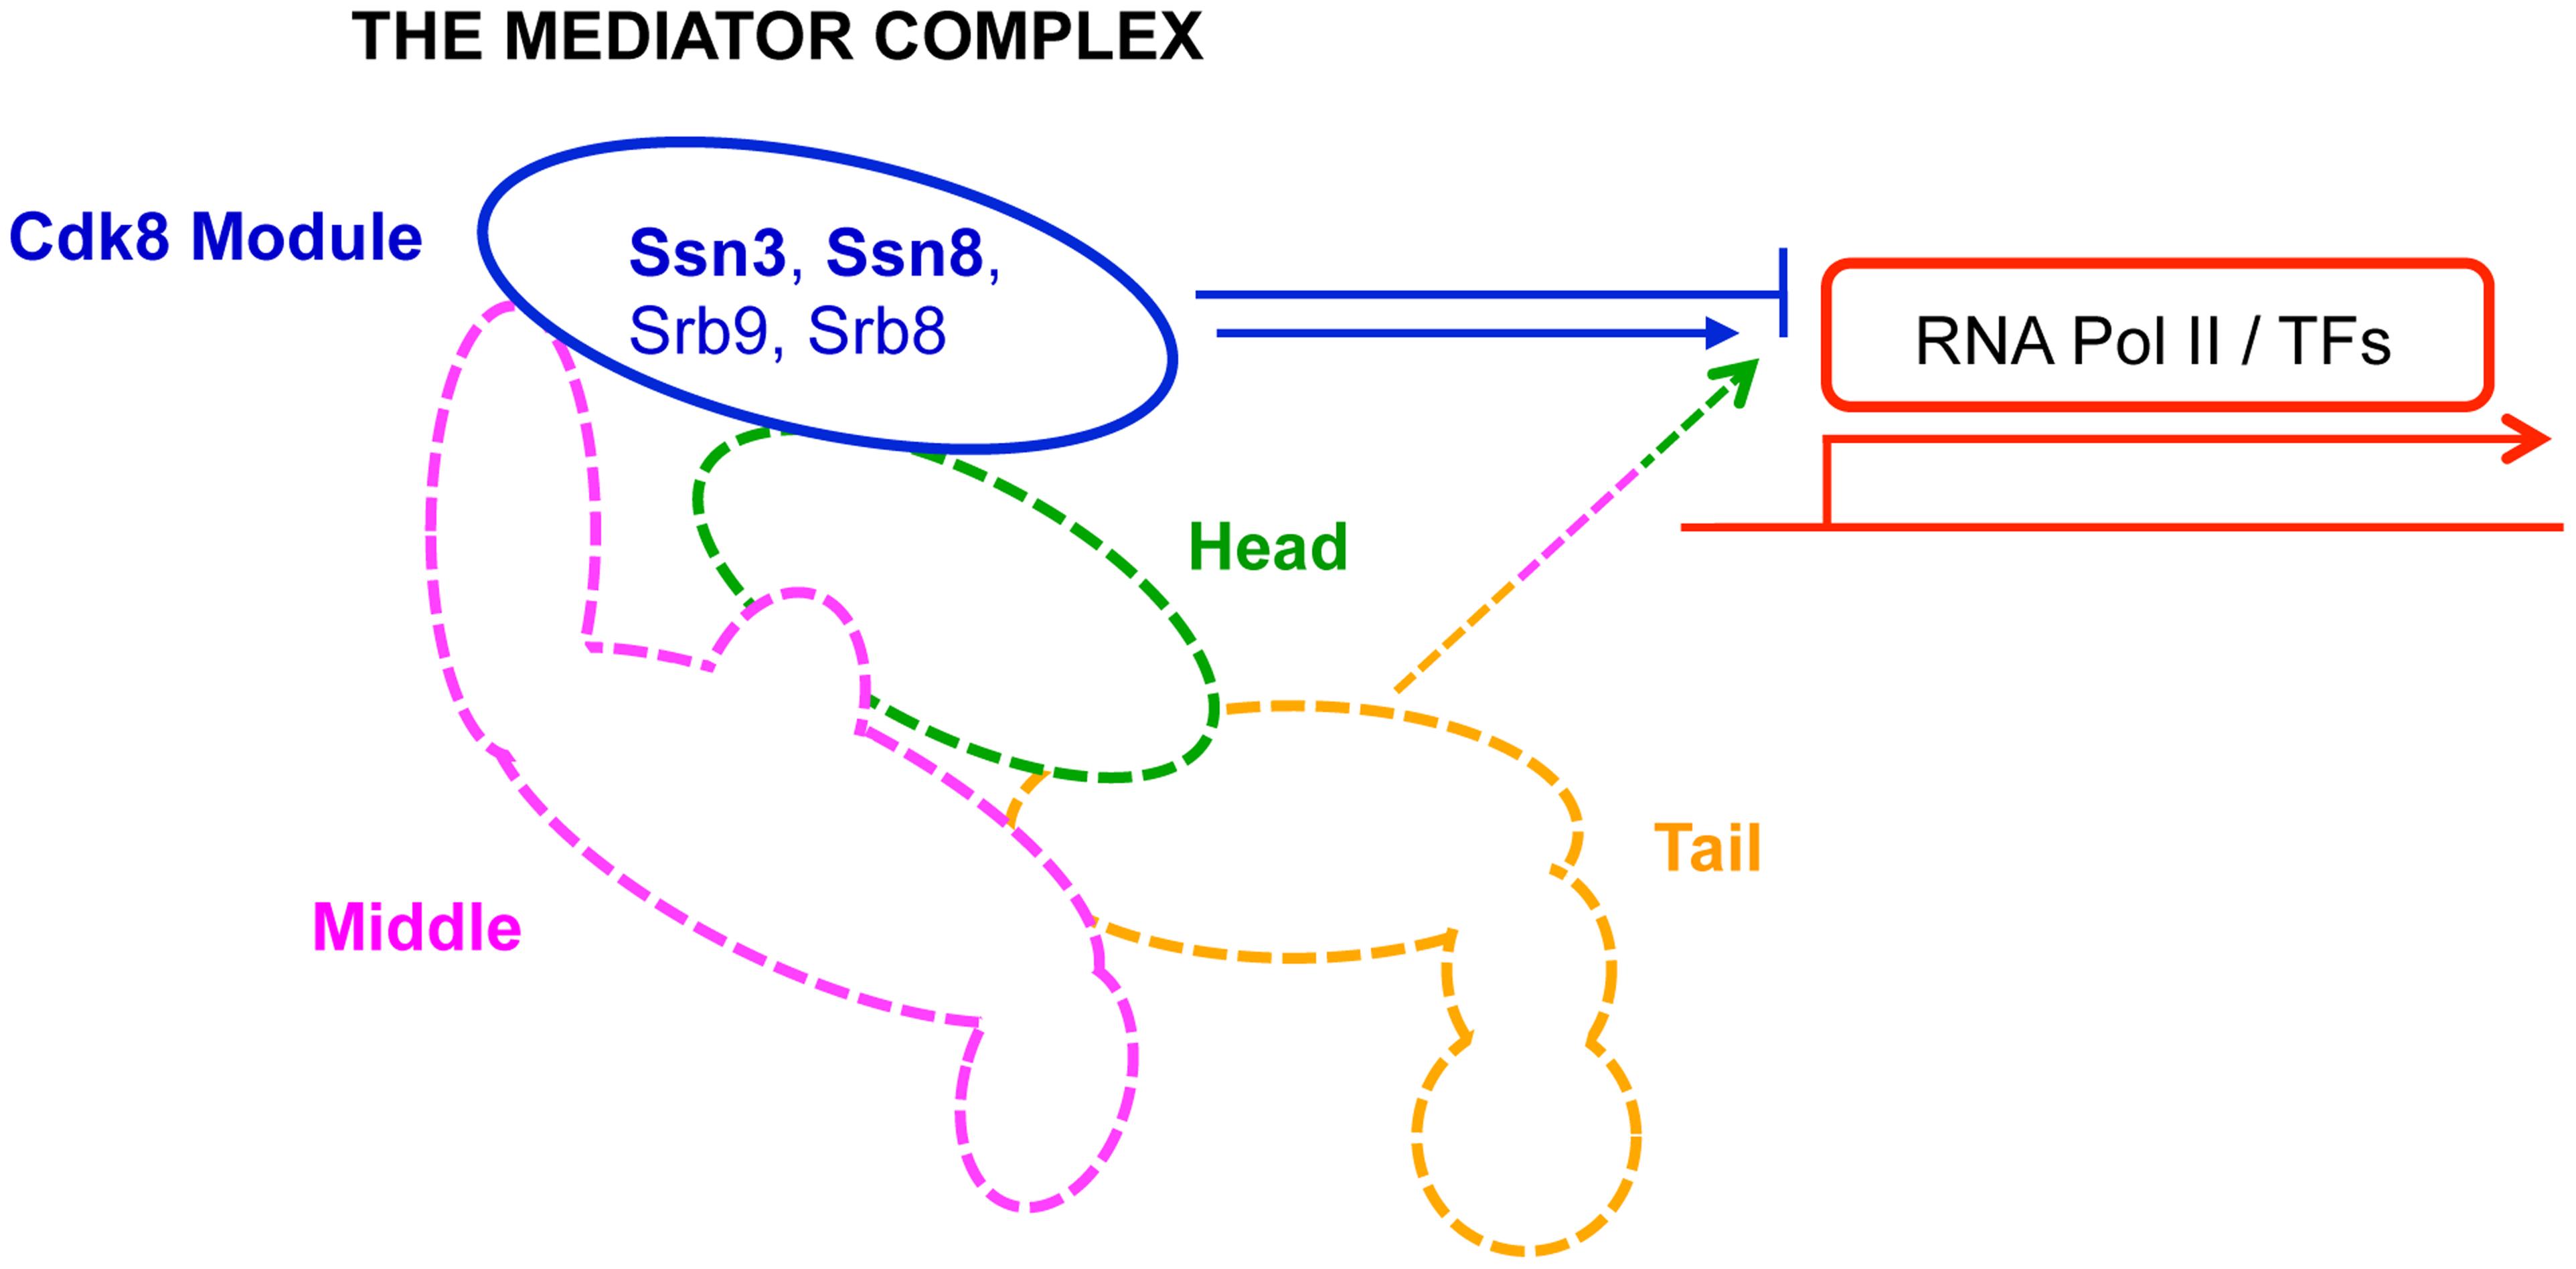 Primary role of Mediator modules in transcription.